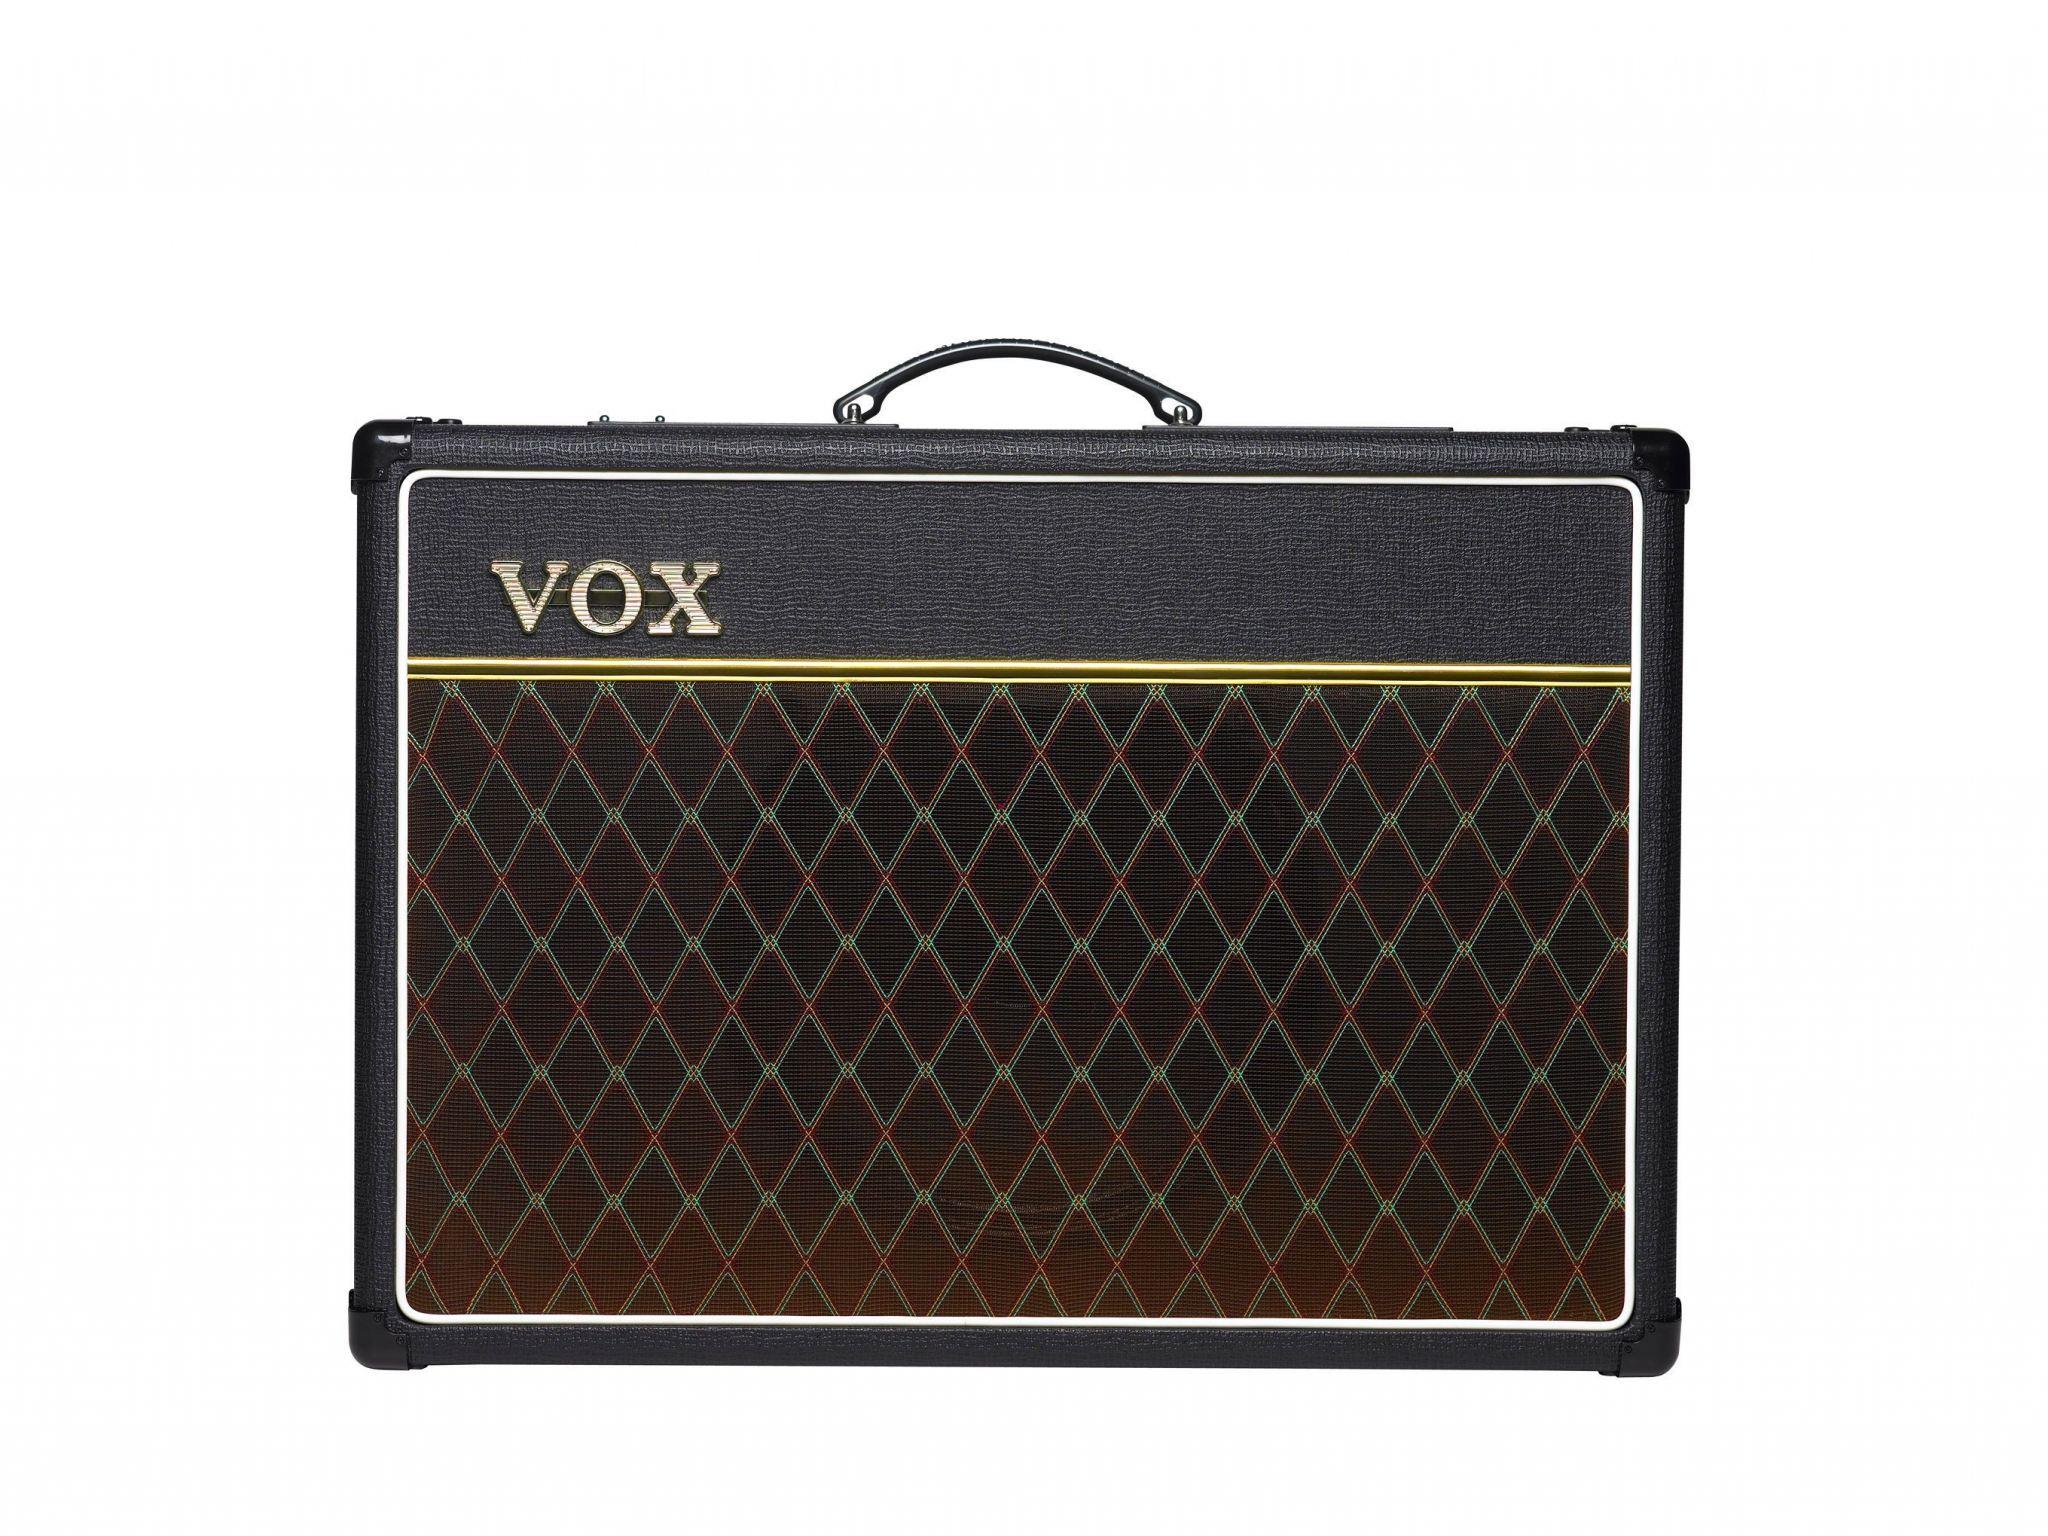 Vox AC15 C1 Amplifier